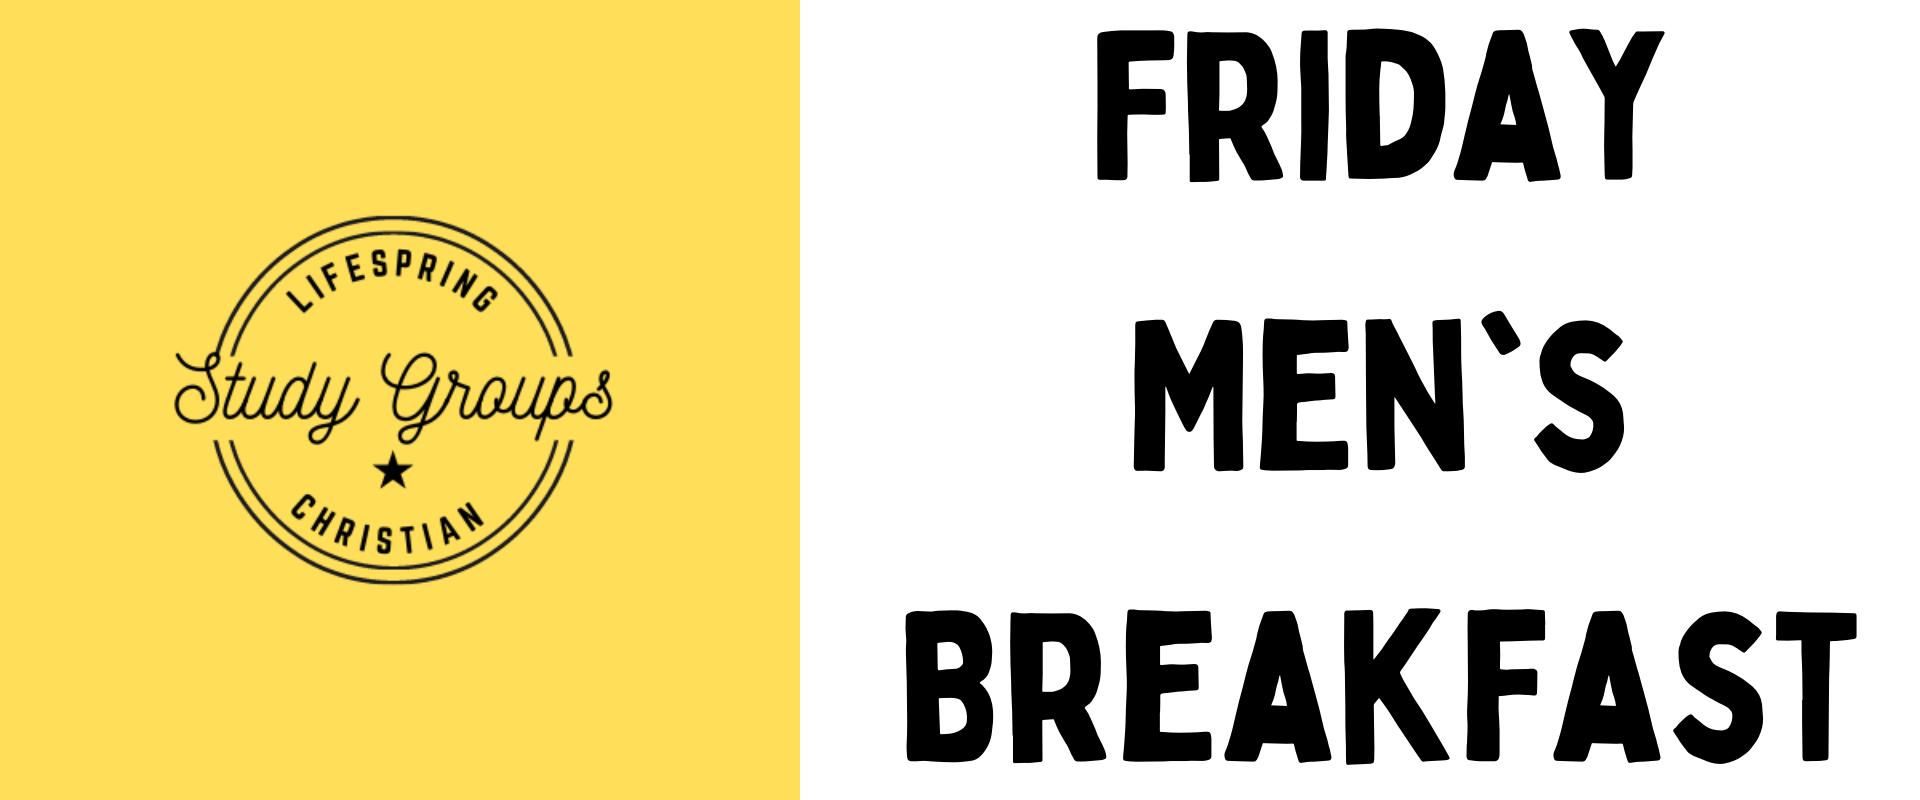 Study Group – Friday Men's Breakfast